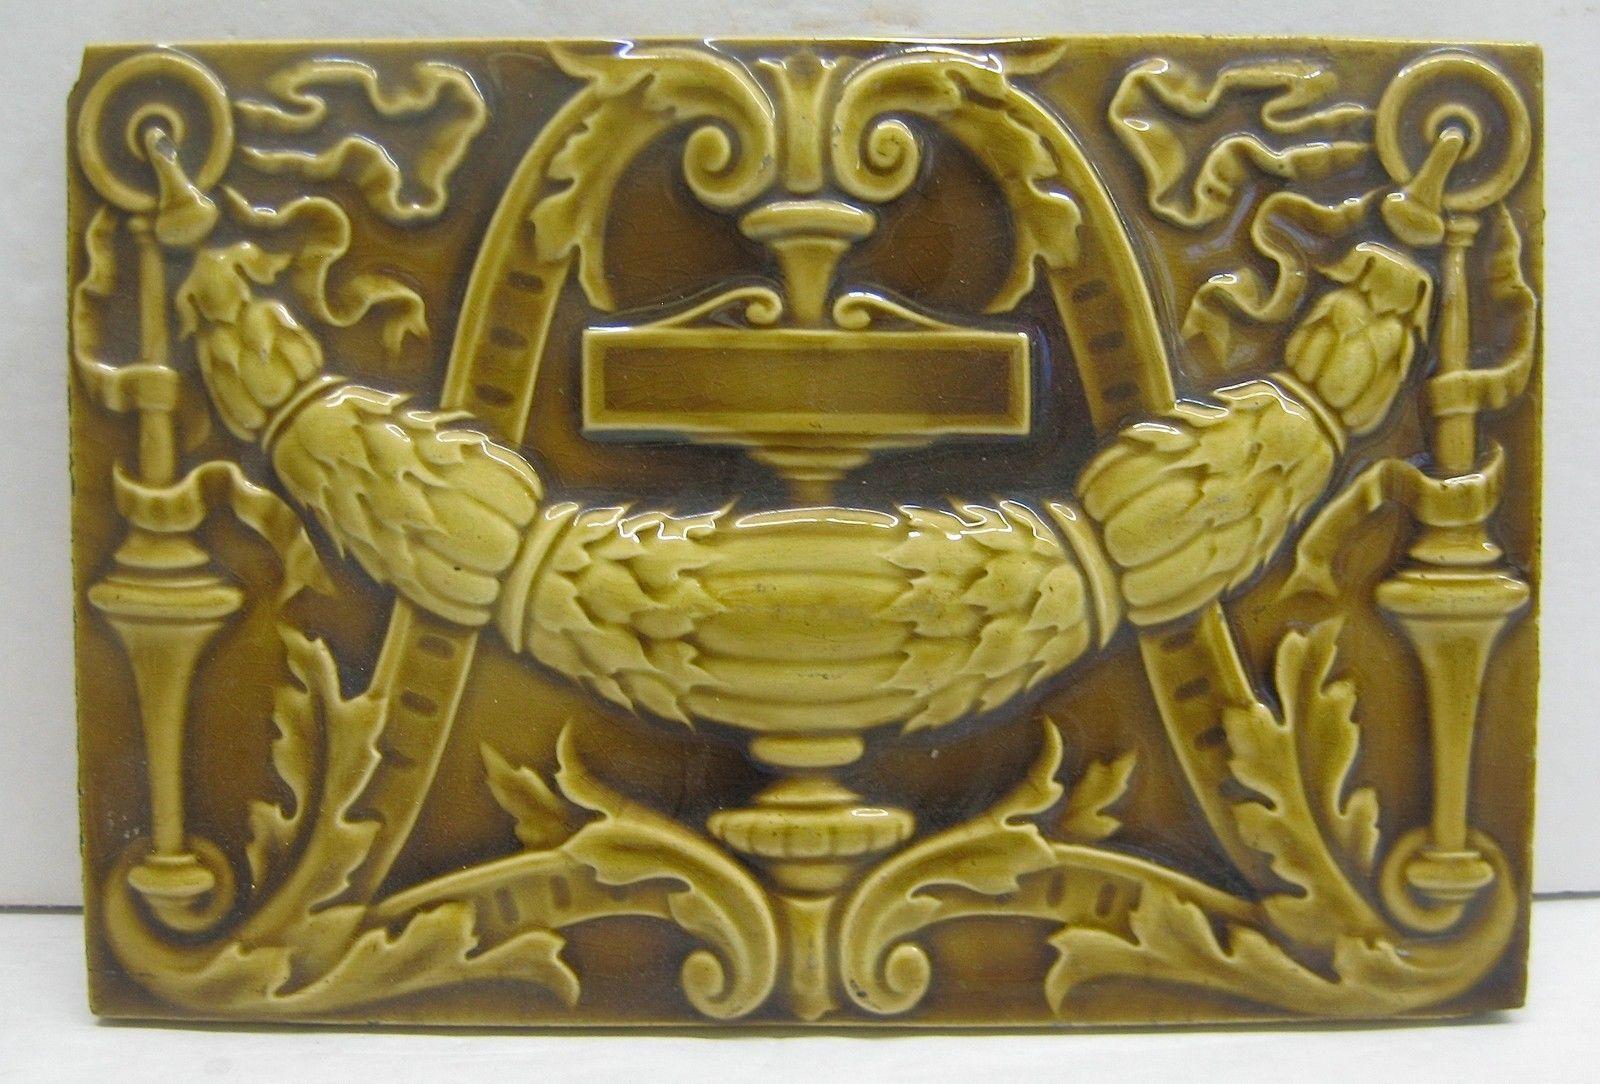 Minton China Works Antique Tile | eBay